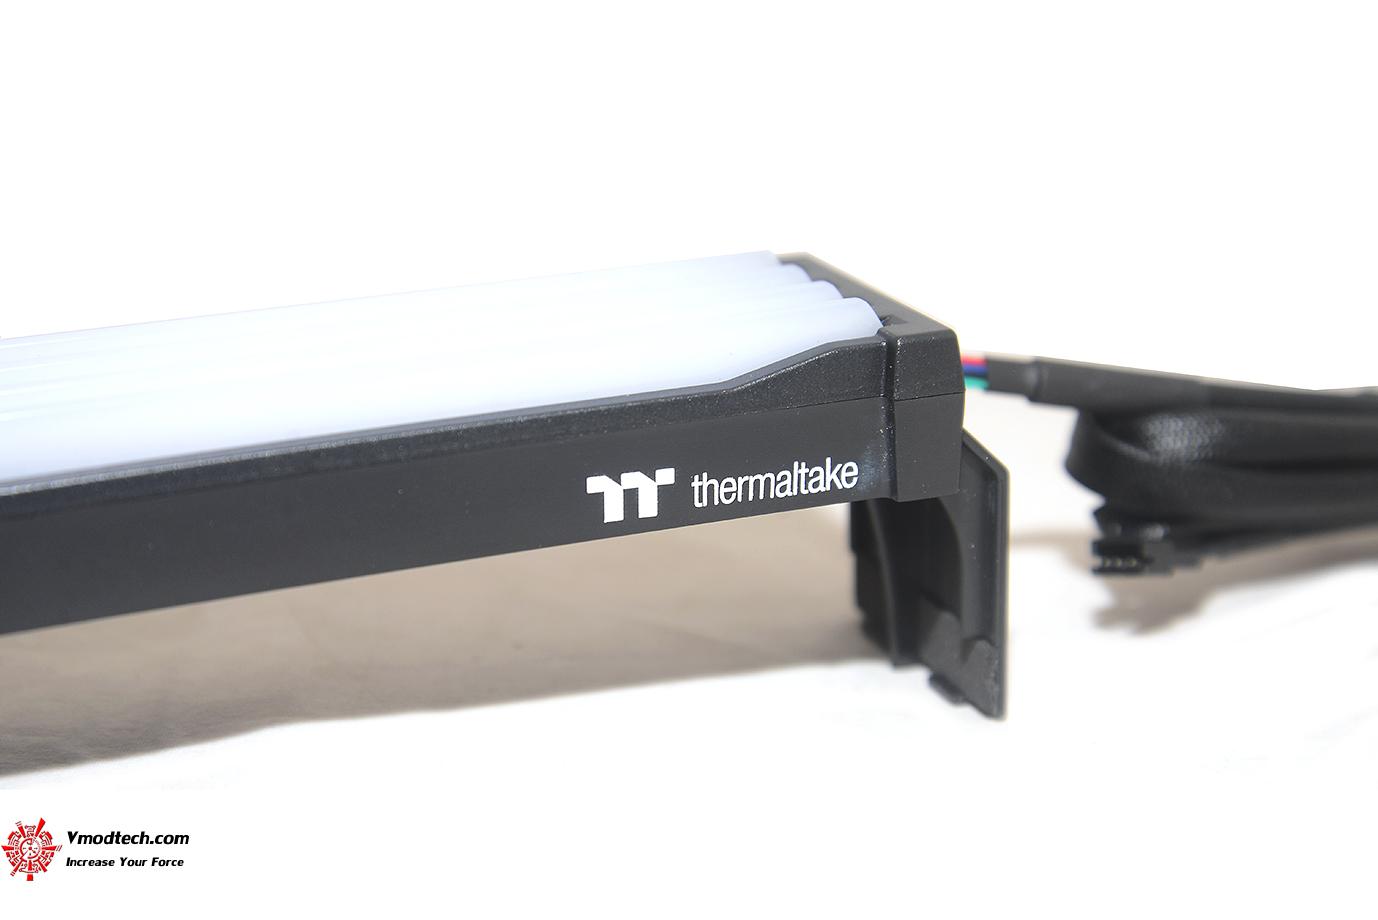 dsc 5514 Thermaltake Pacific R1 Plus DDR4 Memory Lighting Kit Review